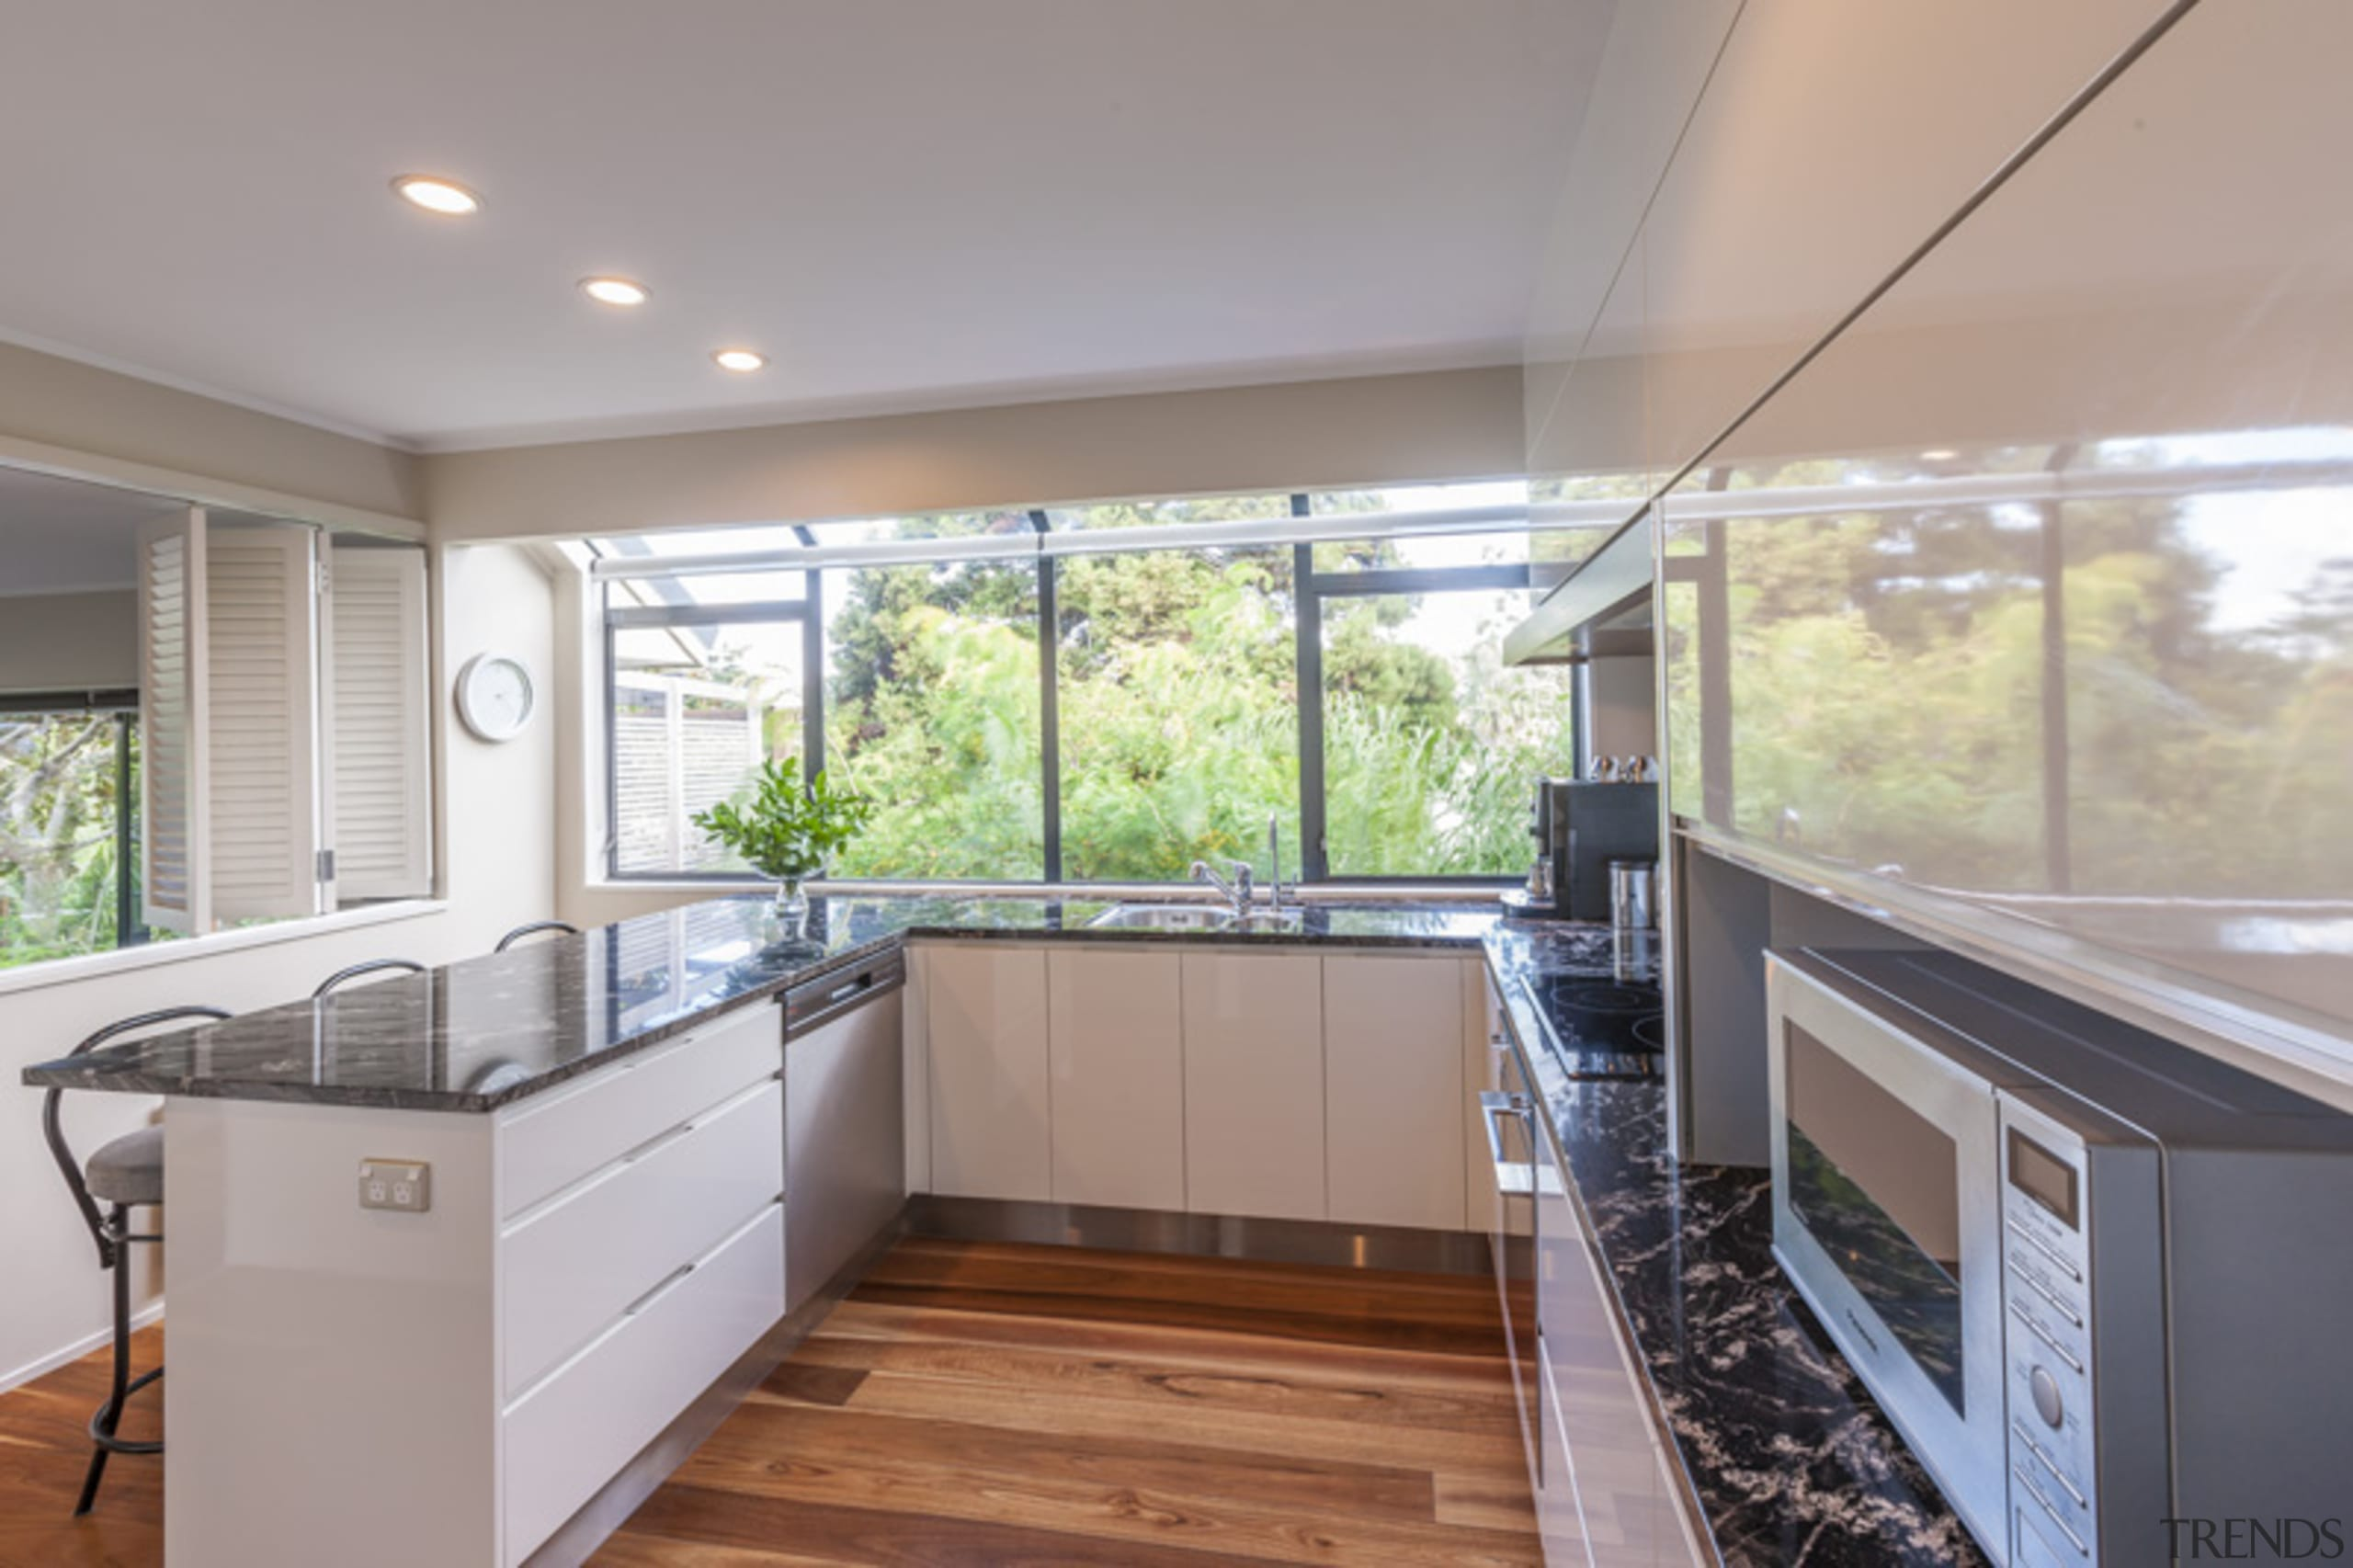 St. Heliers II - countertop   daylighting   countertop, daylighting, home, house, interior design, kitchen, real estate, room, window, gray